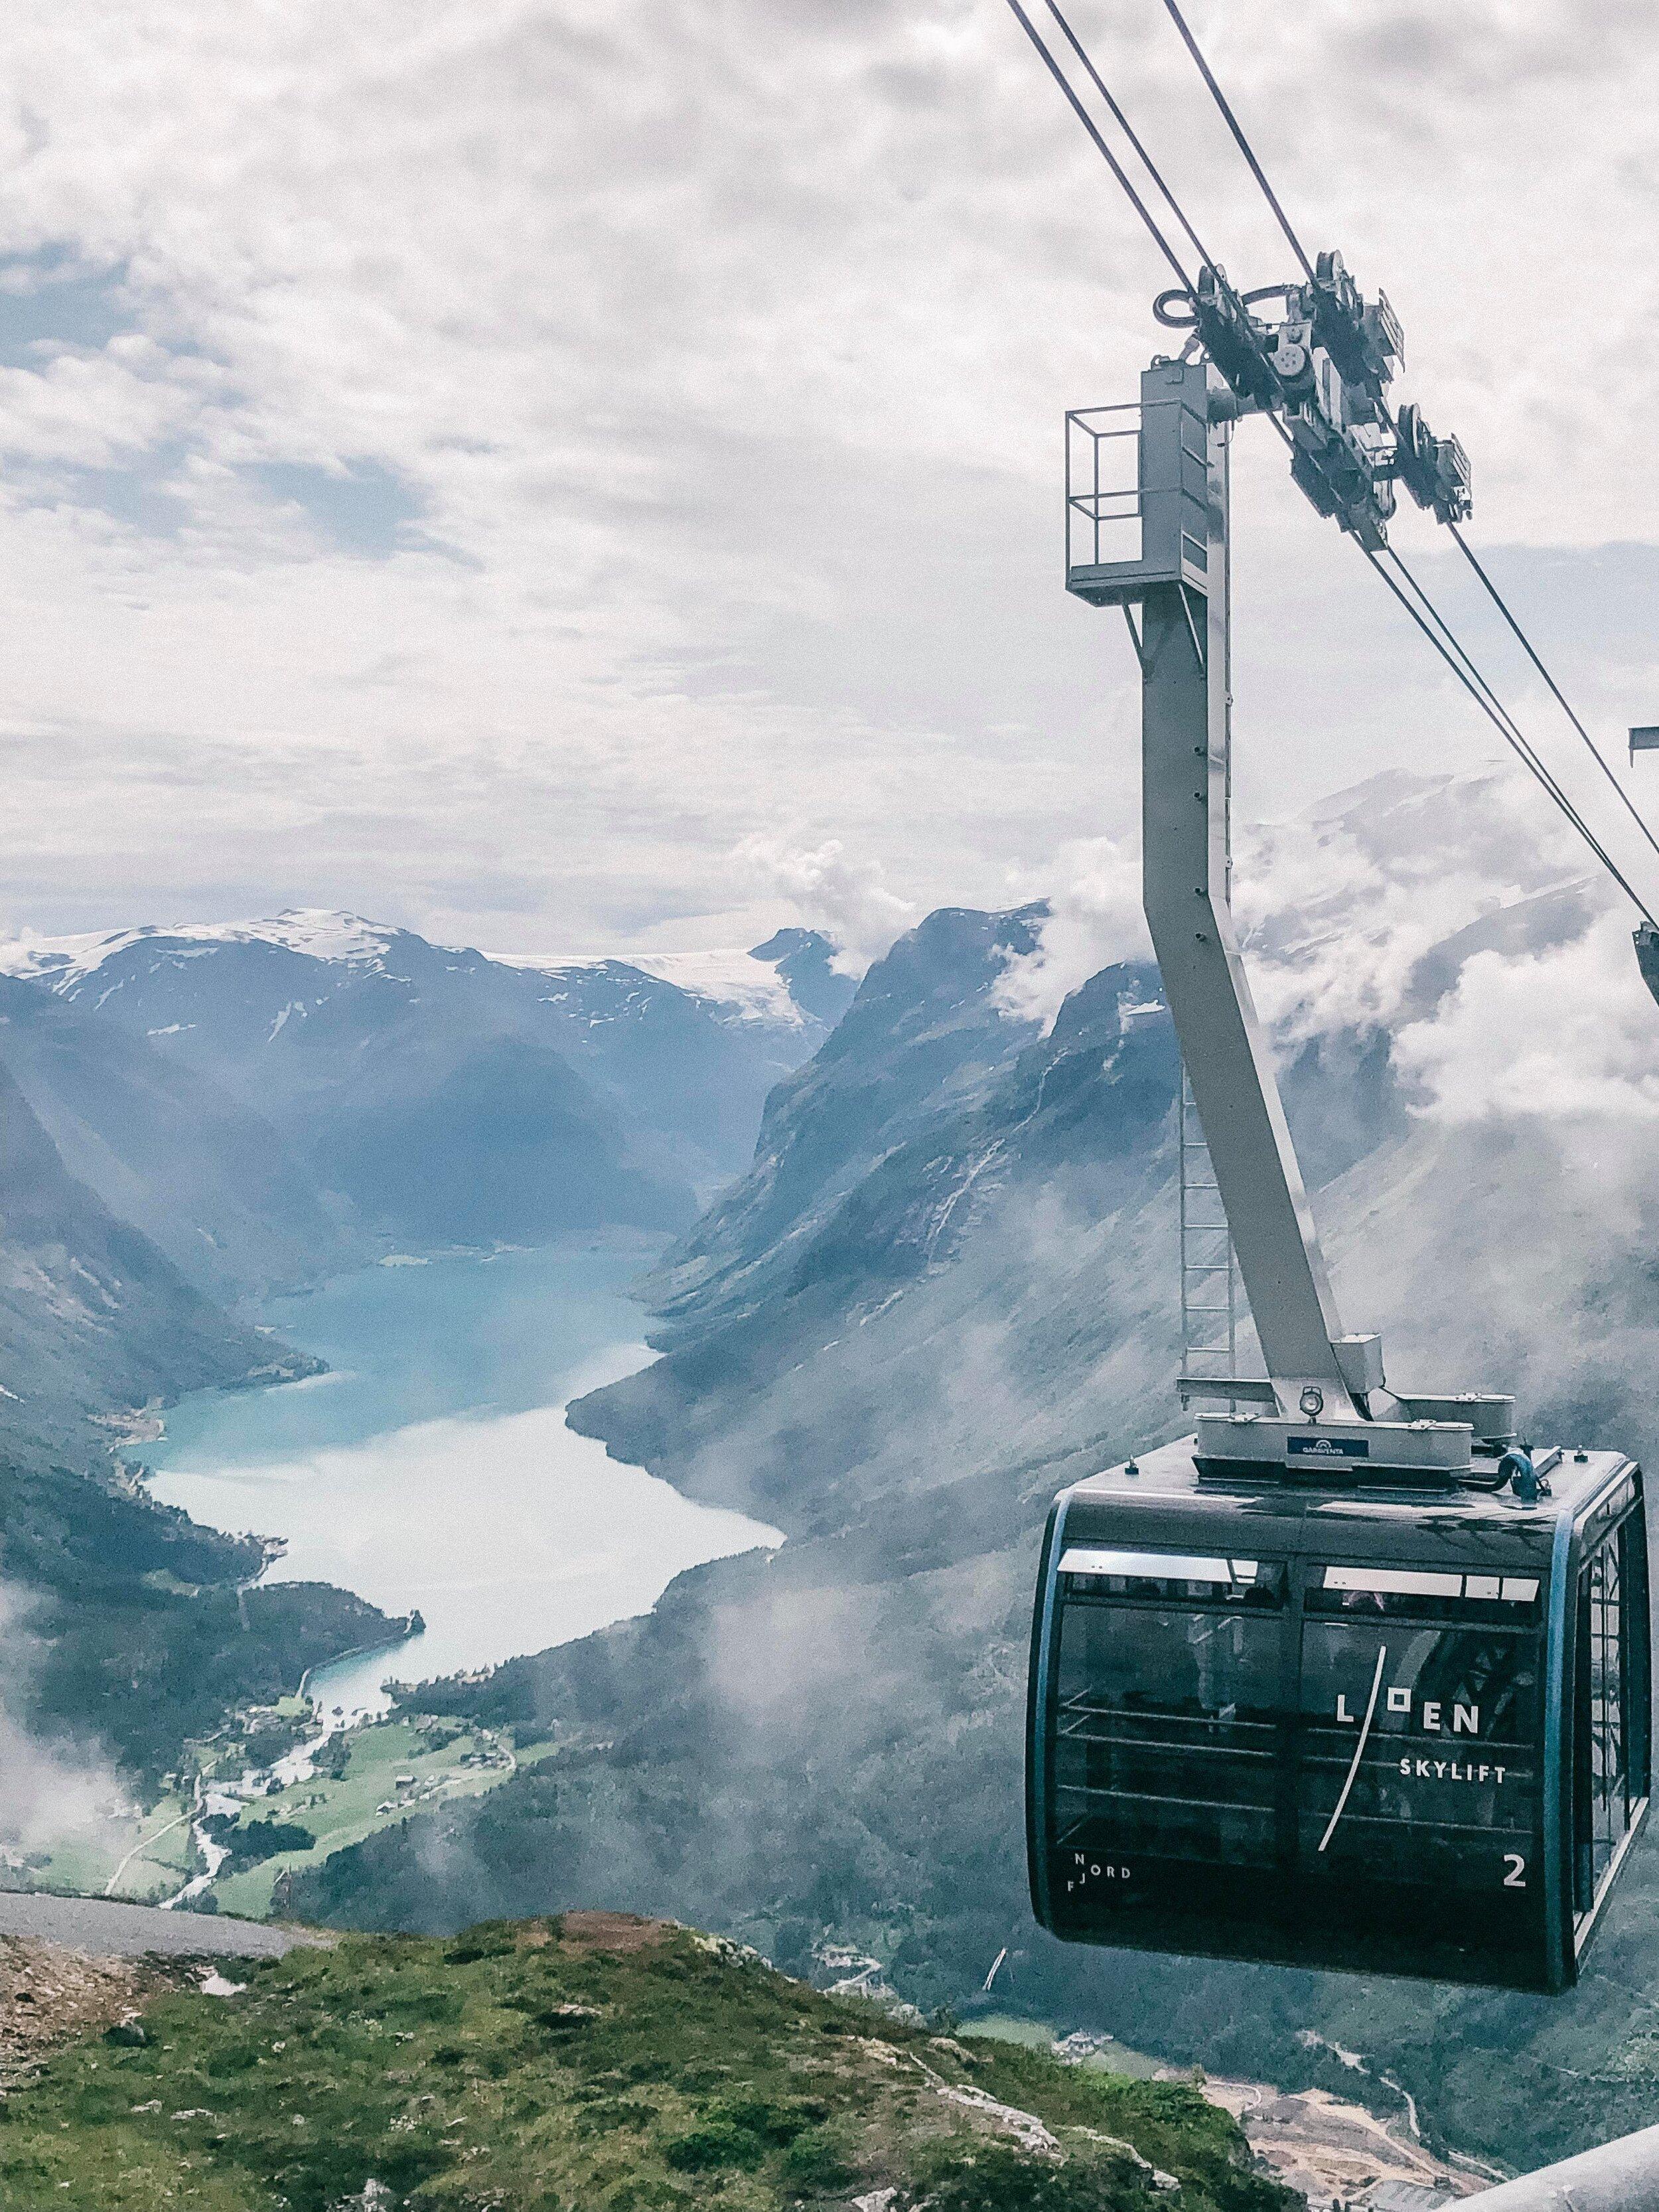 Loen Skylift. Foto: Sølvi Dybevold